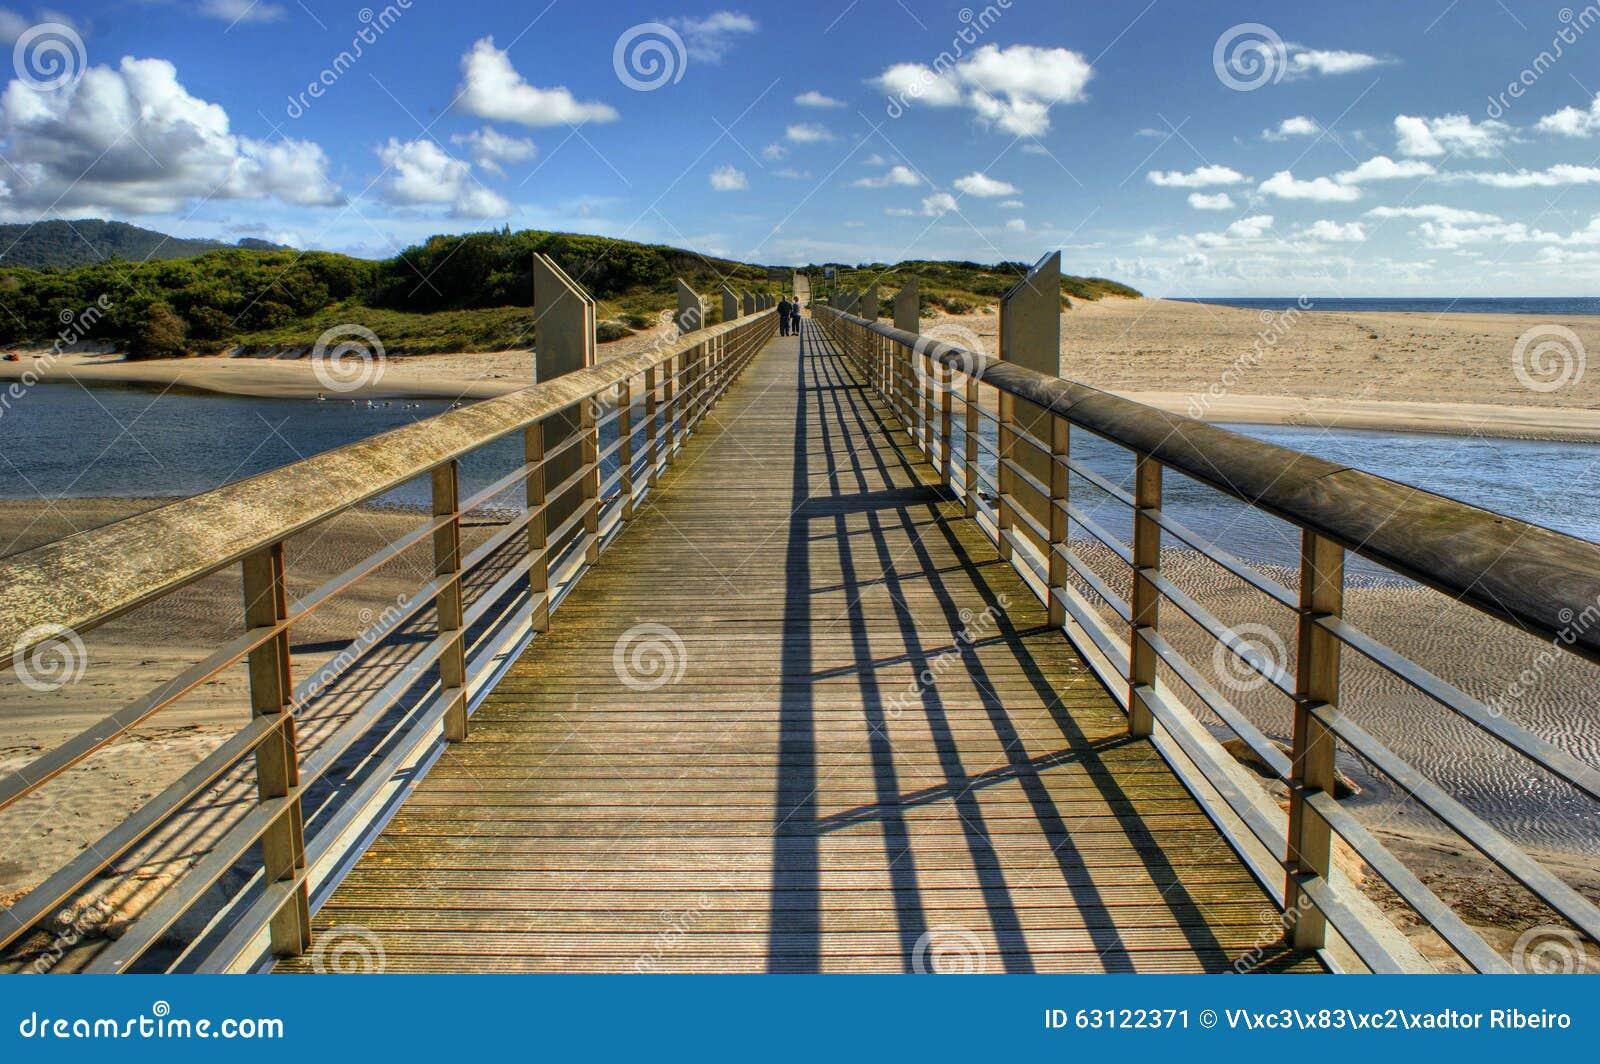 Pawn bridge in Vila Praia de Ancora